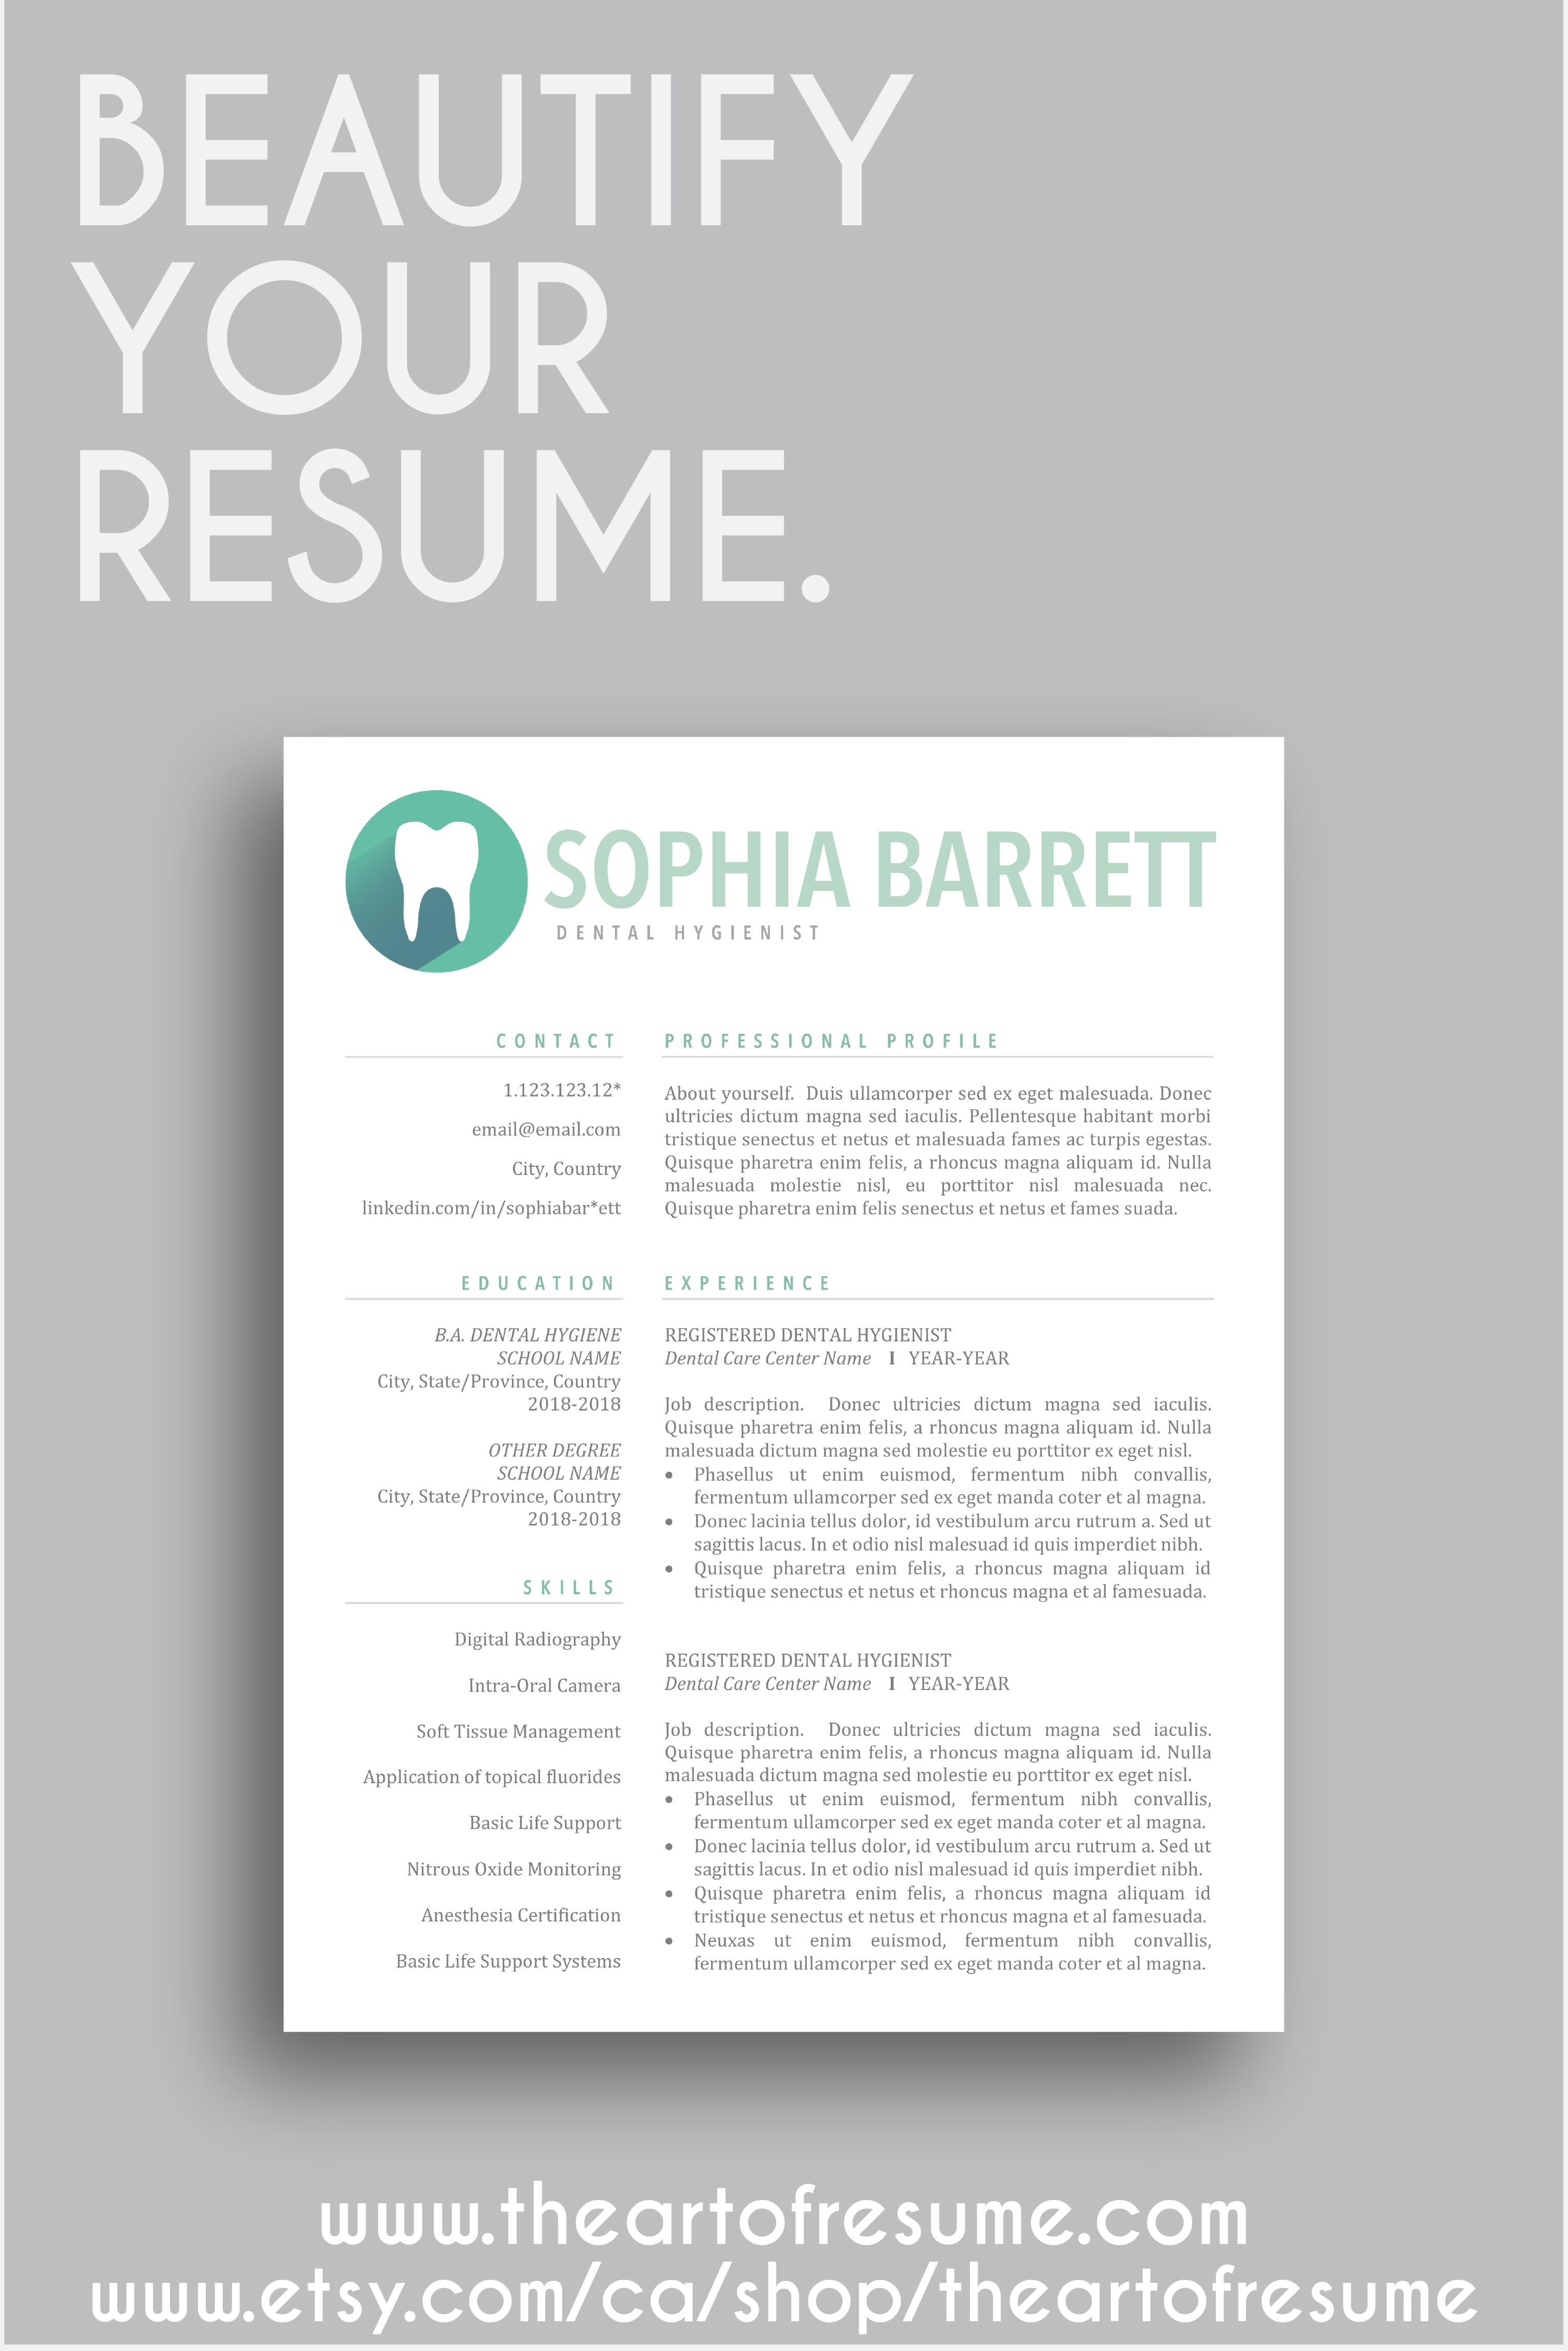 Dental Hygienist Resume CV Dentist Template Assistant